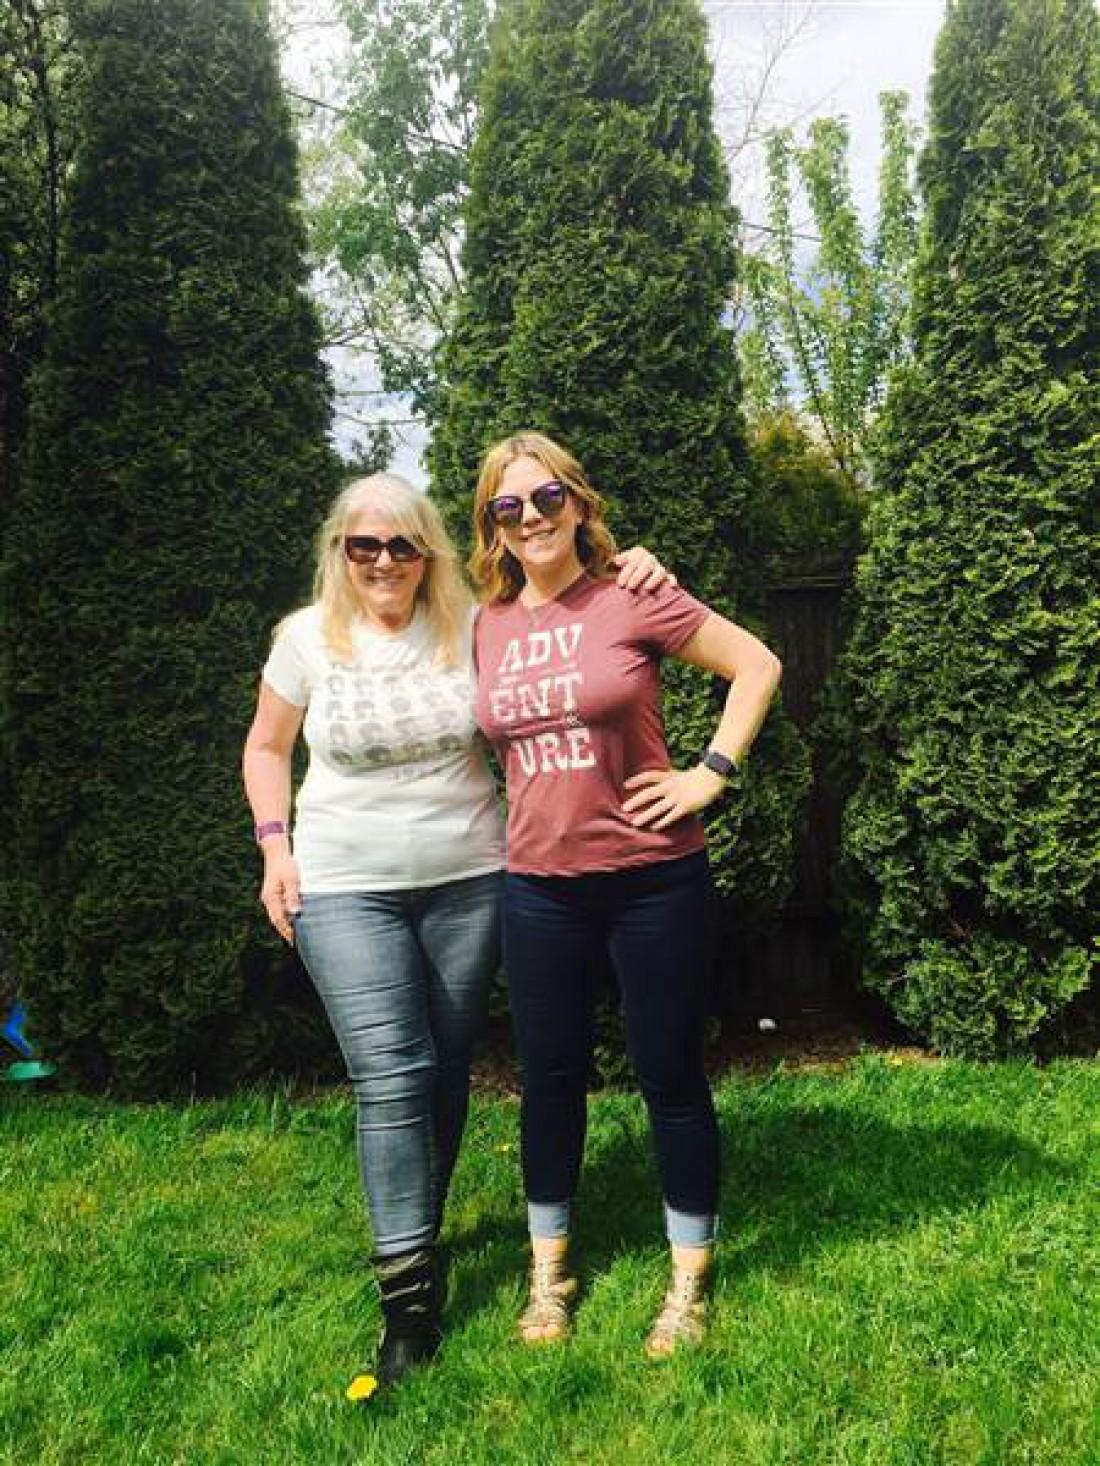 Диана и Дана сбросили 50 кг на двоих